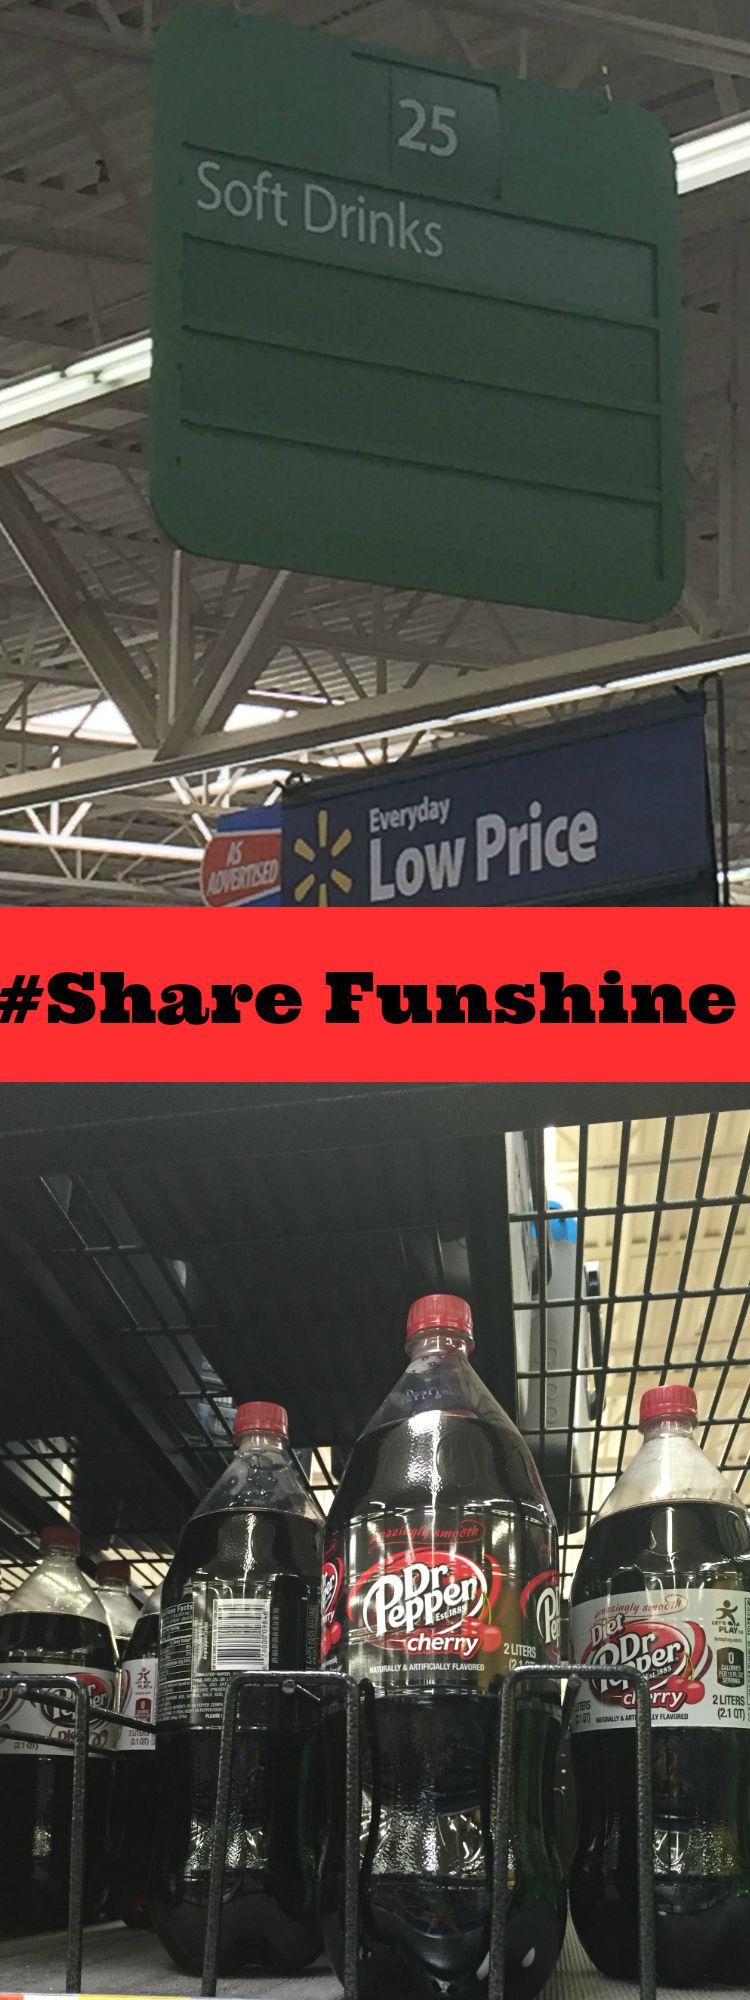 Share Funshine